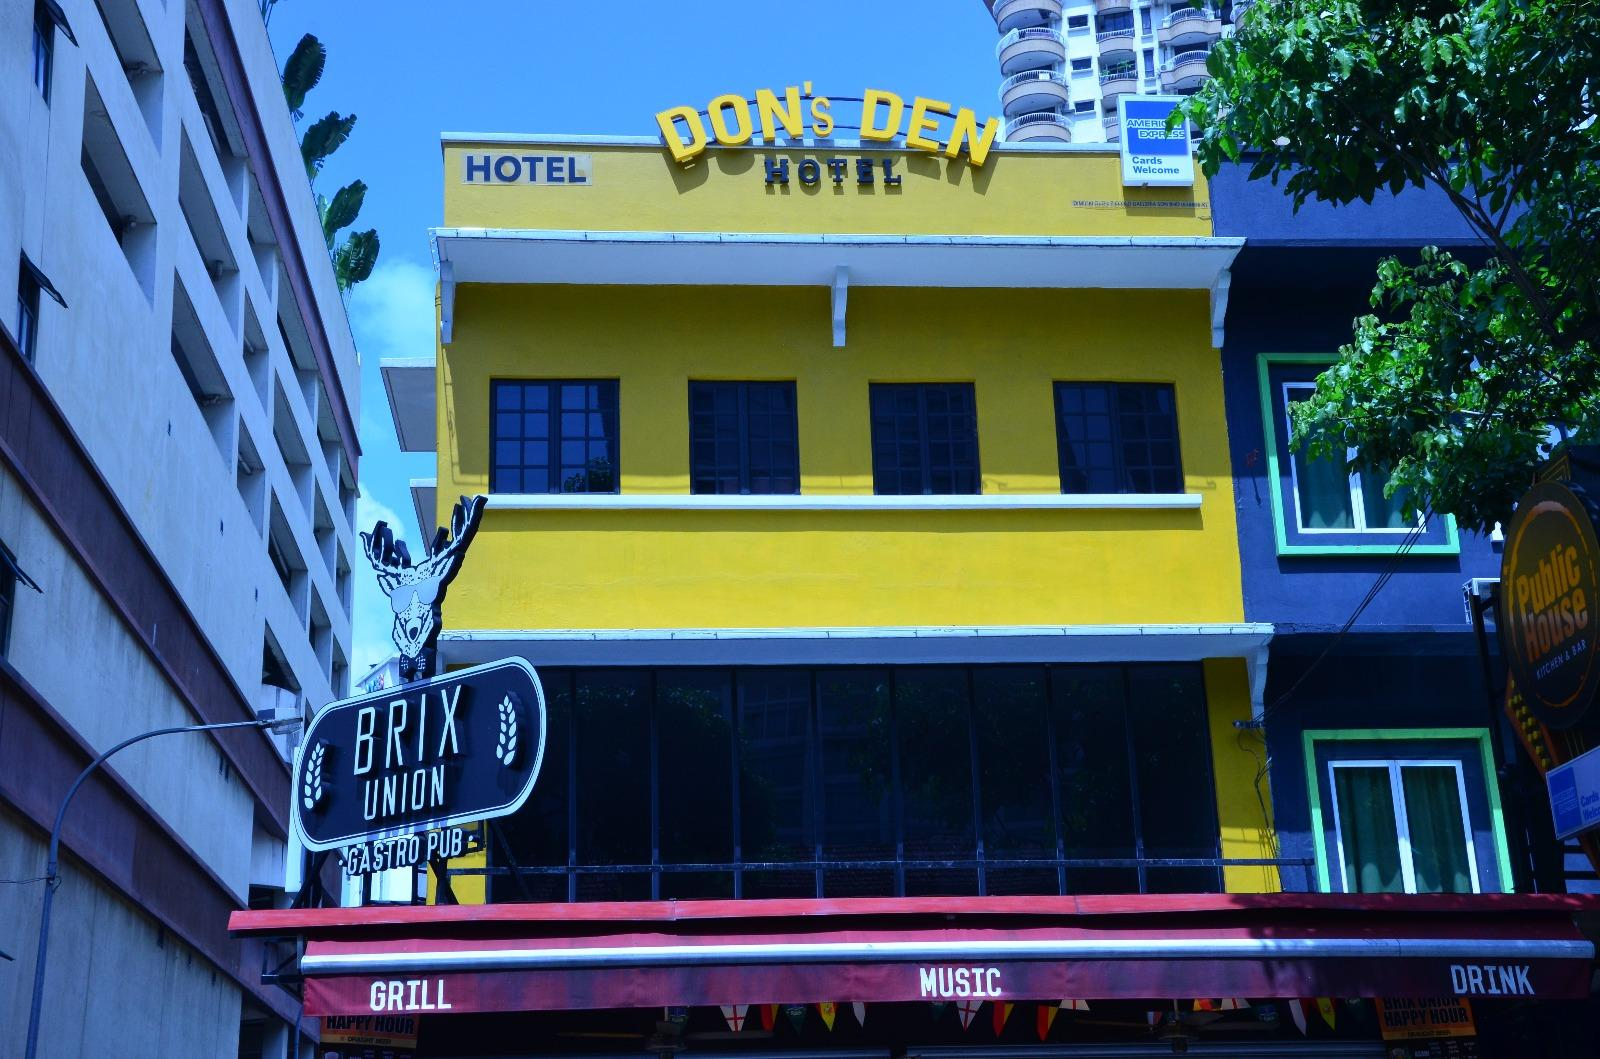 Don's Den Hotel